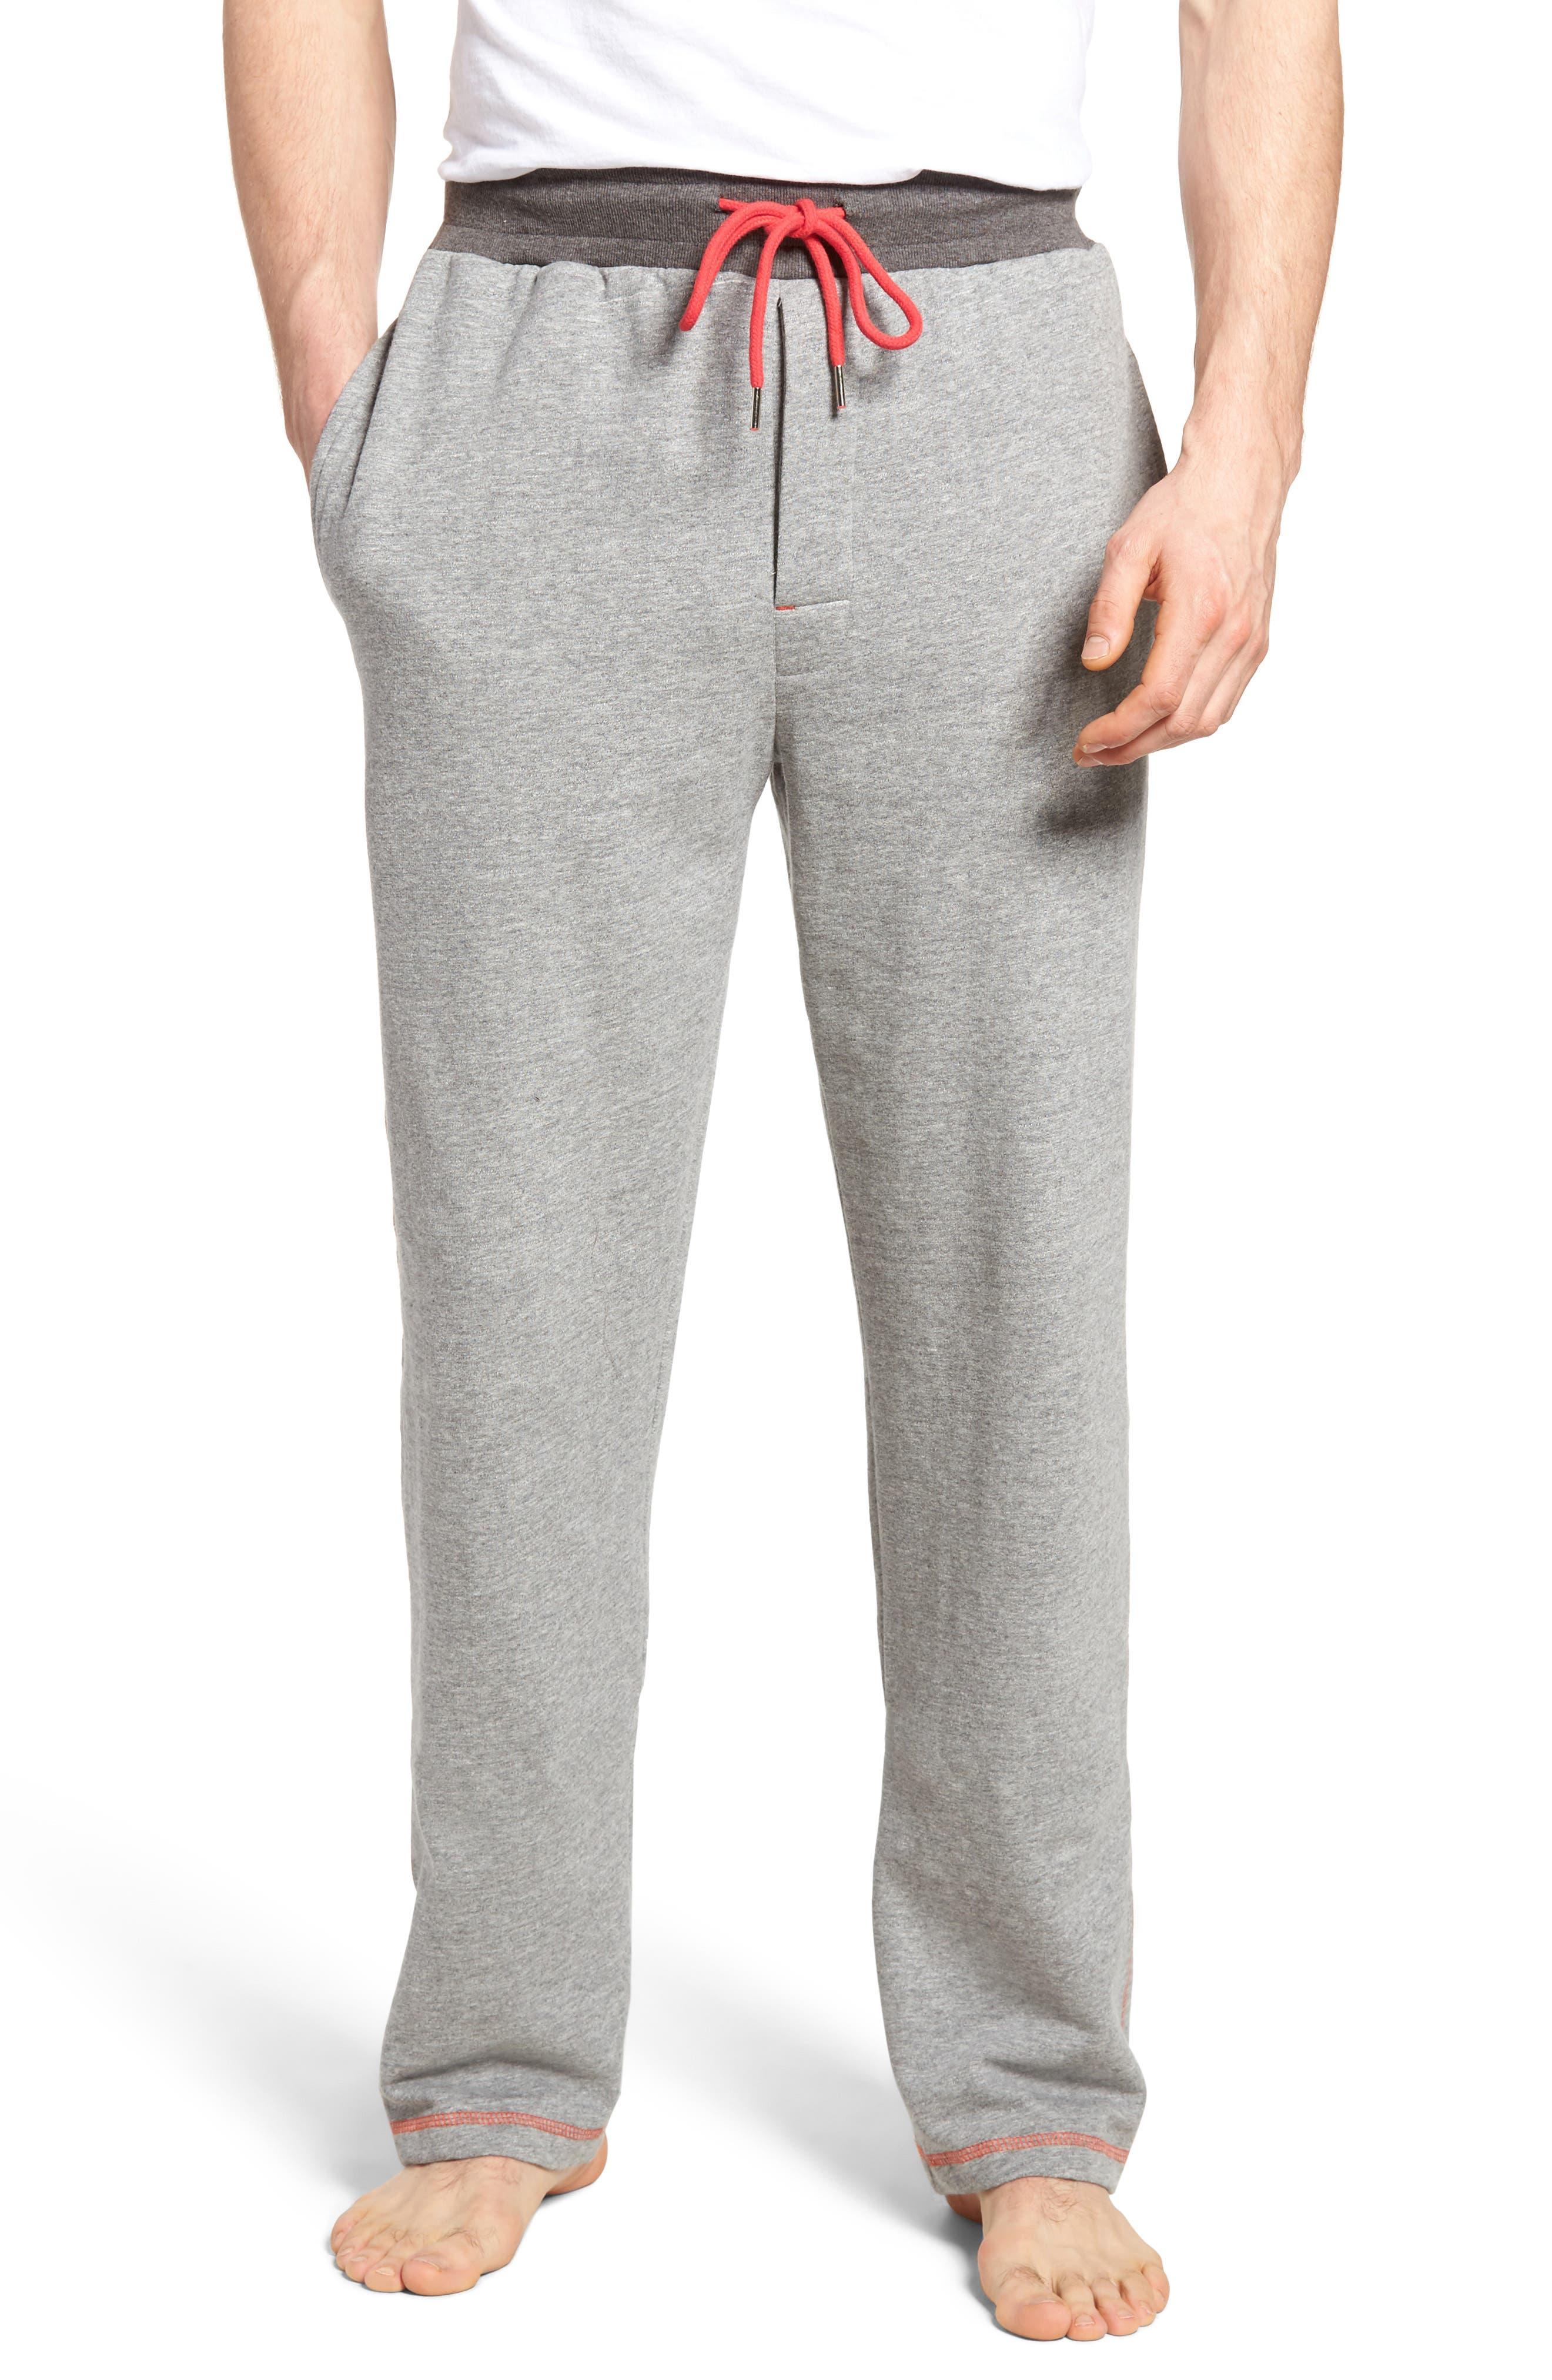 Bhooka Cotton Blend Lounge Pants,                             Main thumbnail 1, color,                             020